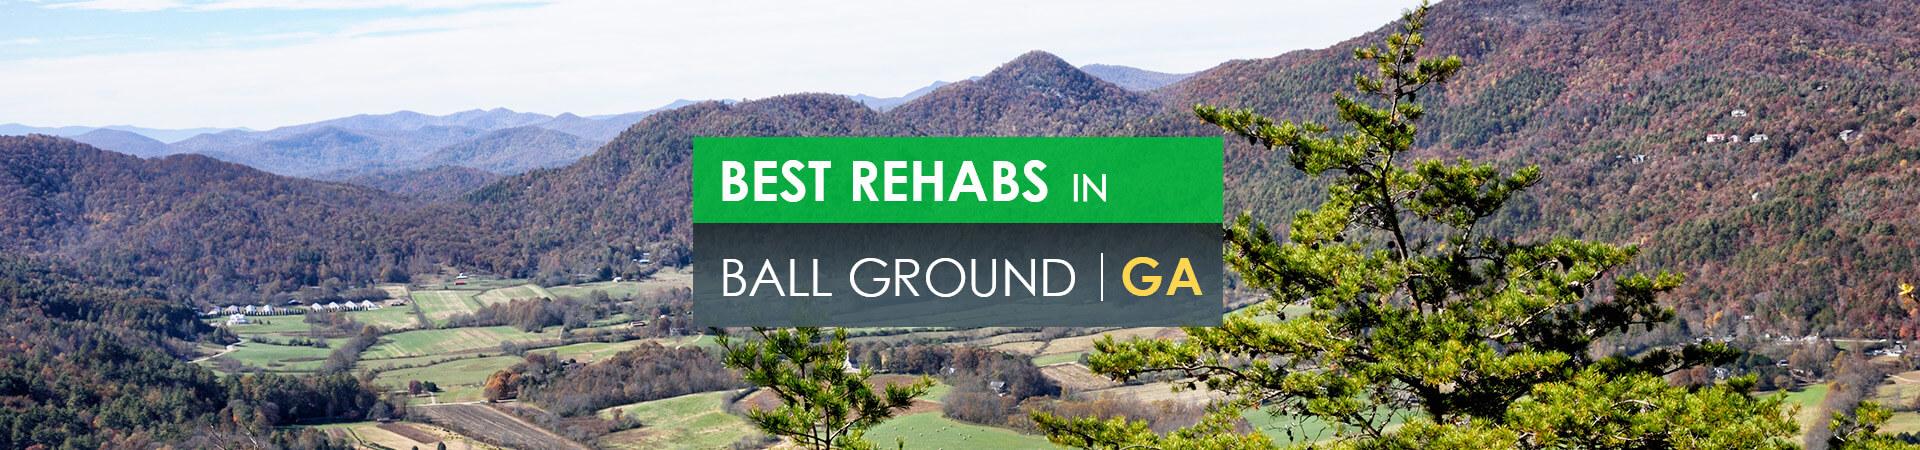 Best rehabs in Ball Ground, GA